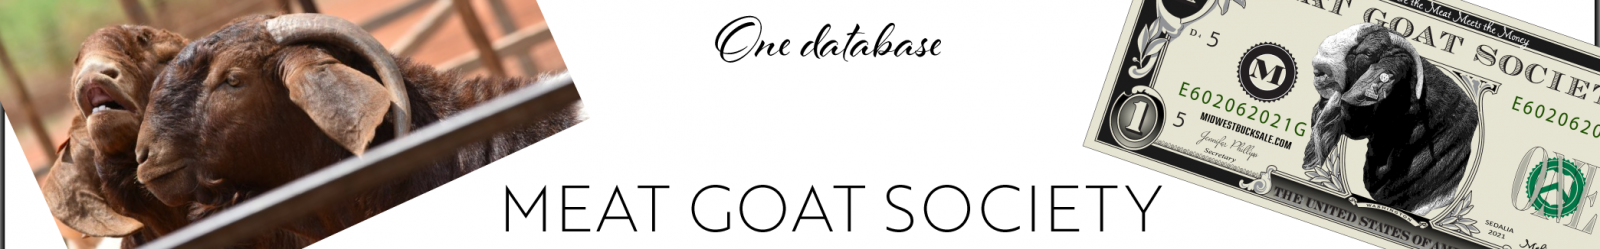 Meat Goat Society